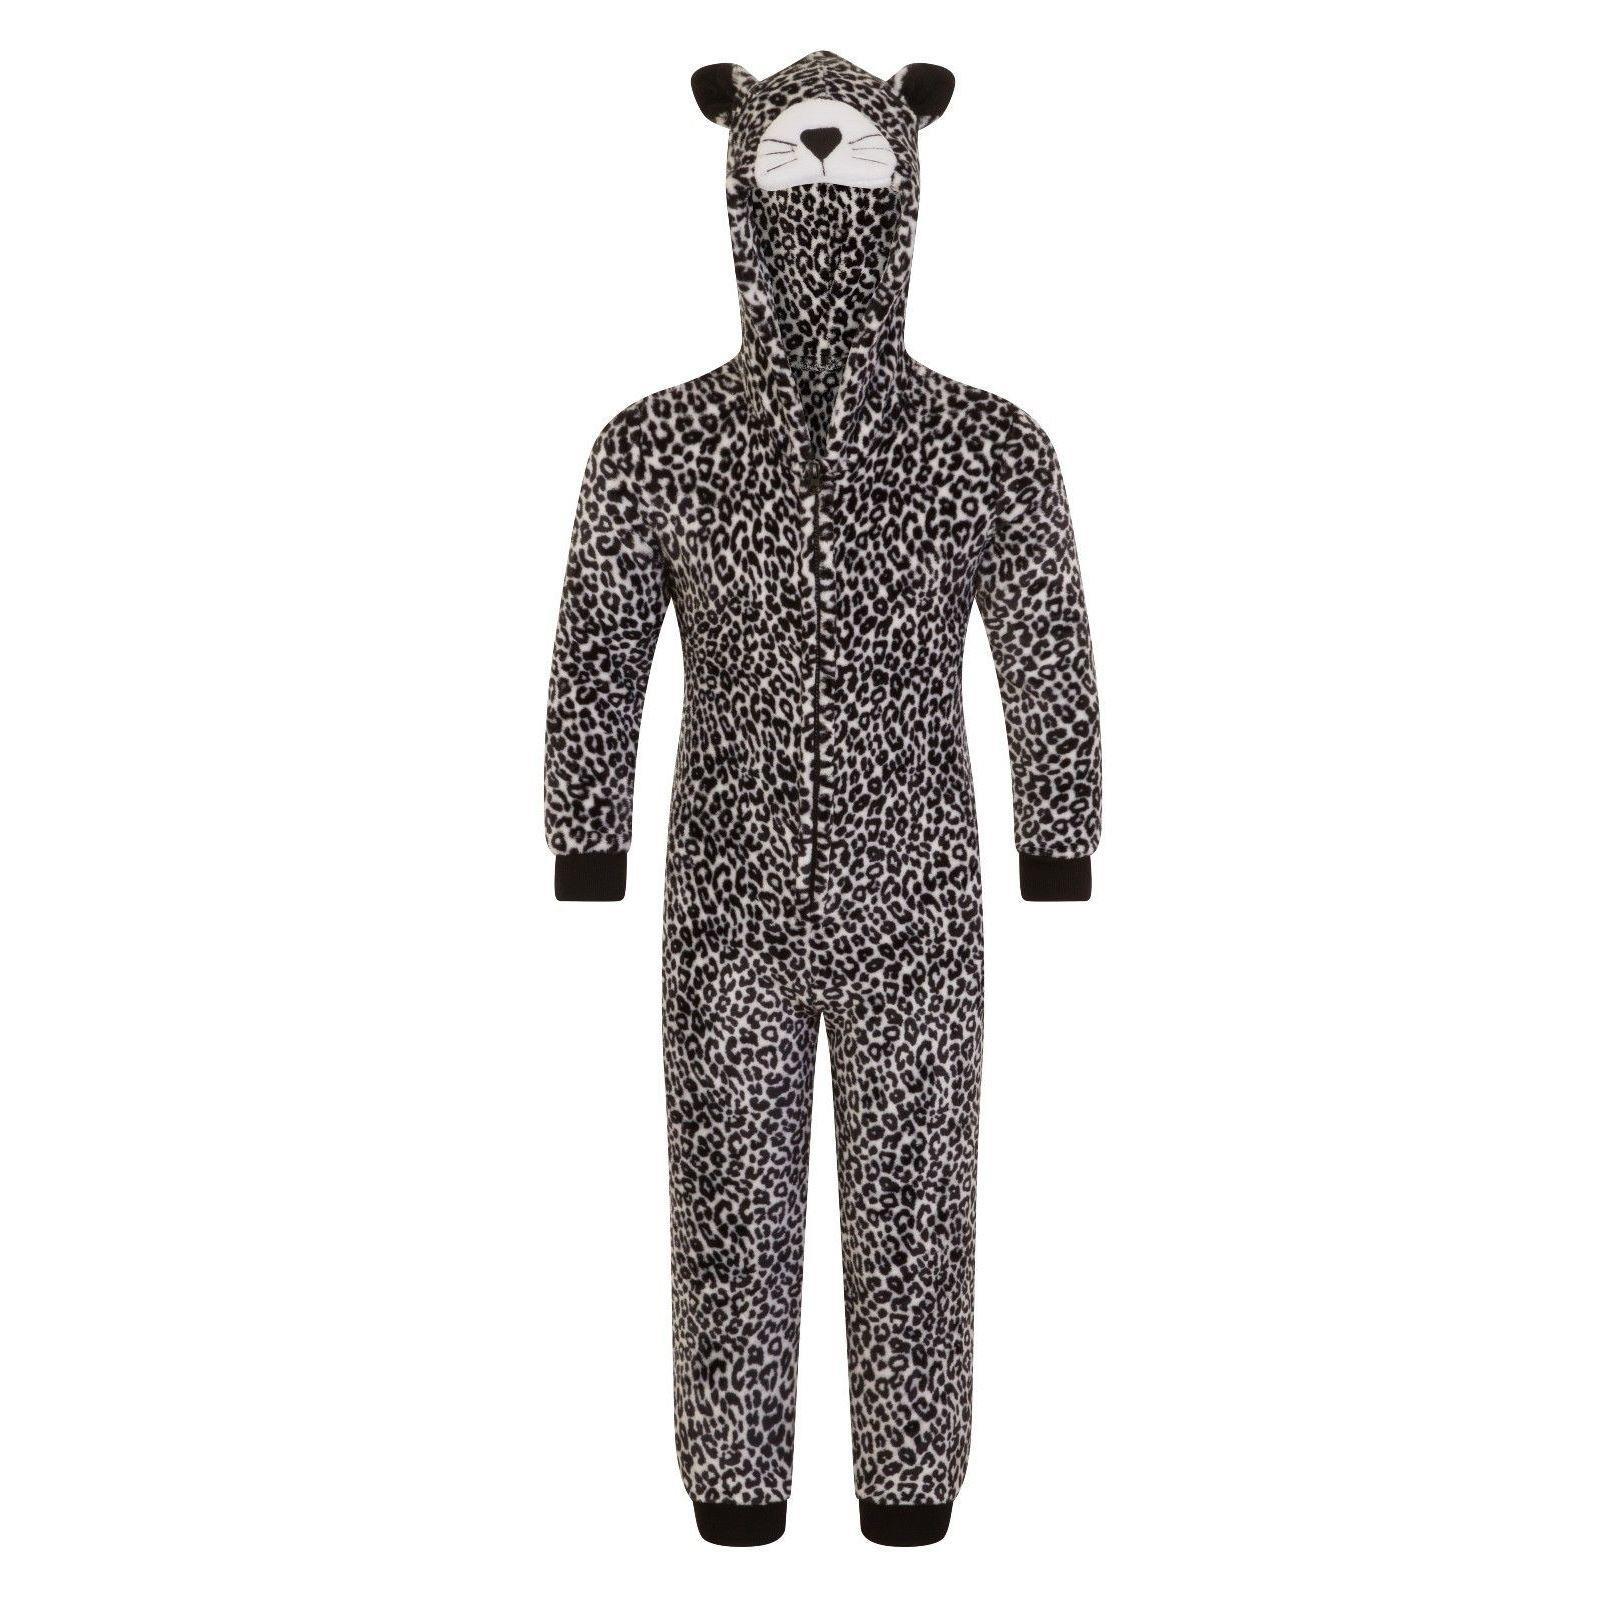 Nifty Kids Leopard Fleece Onesie